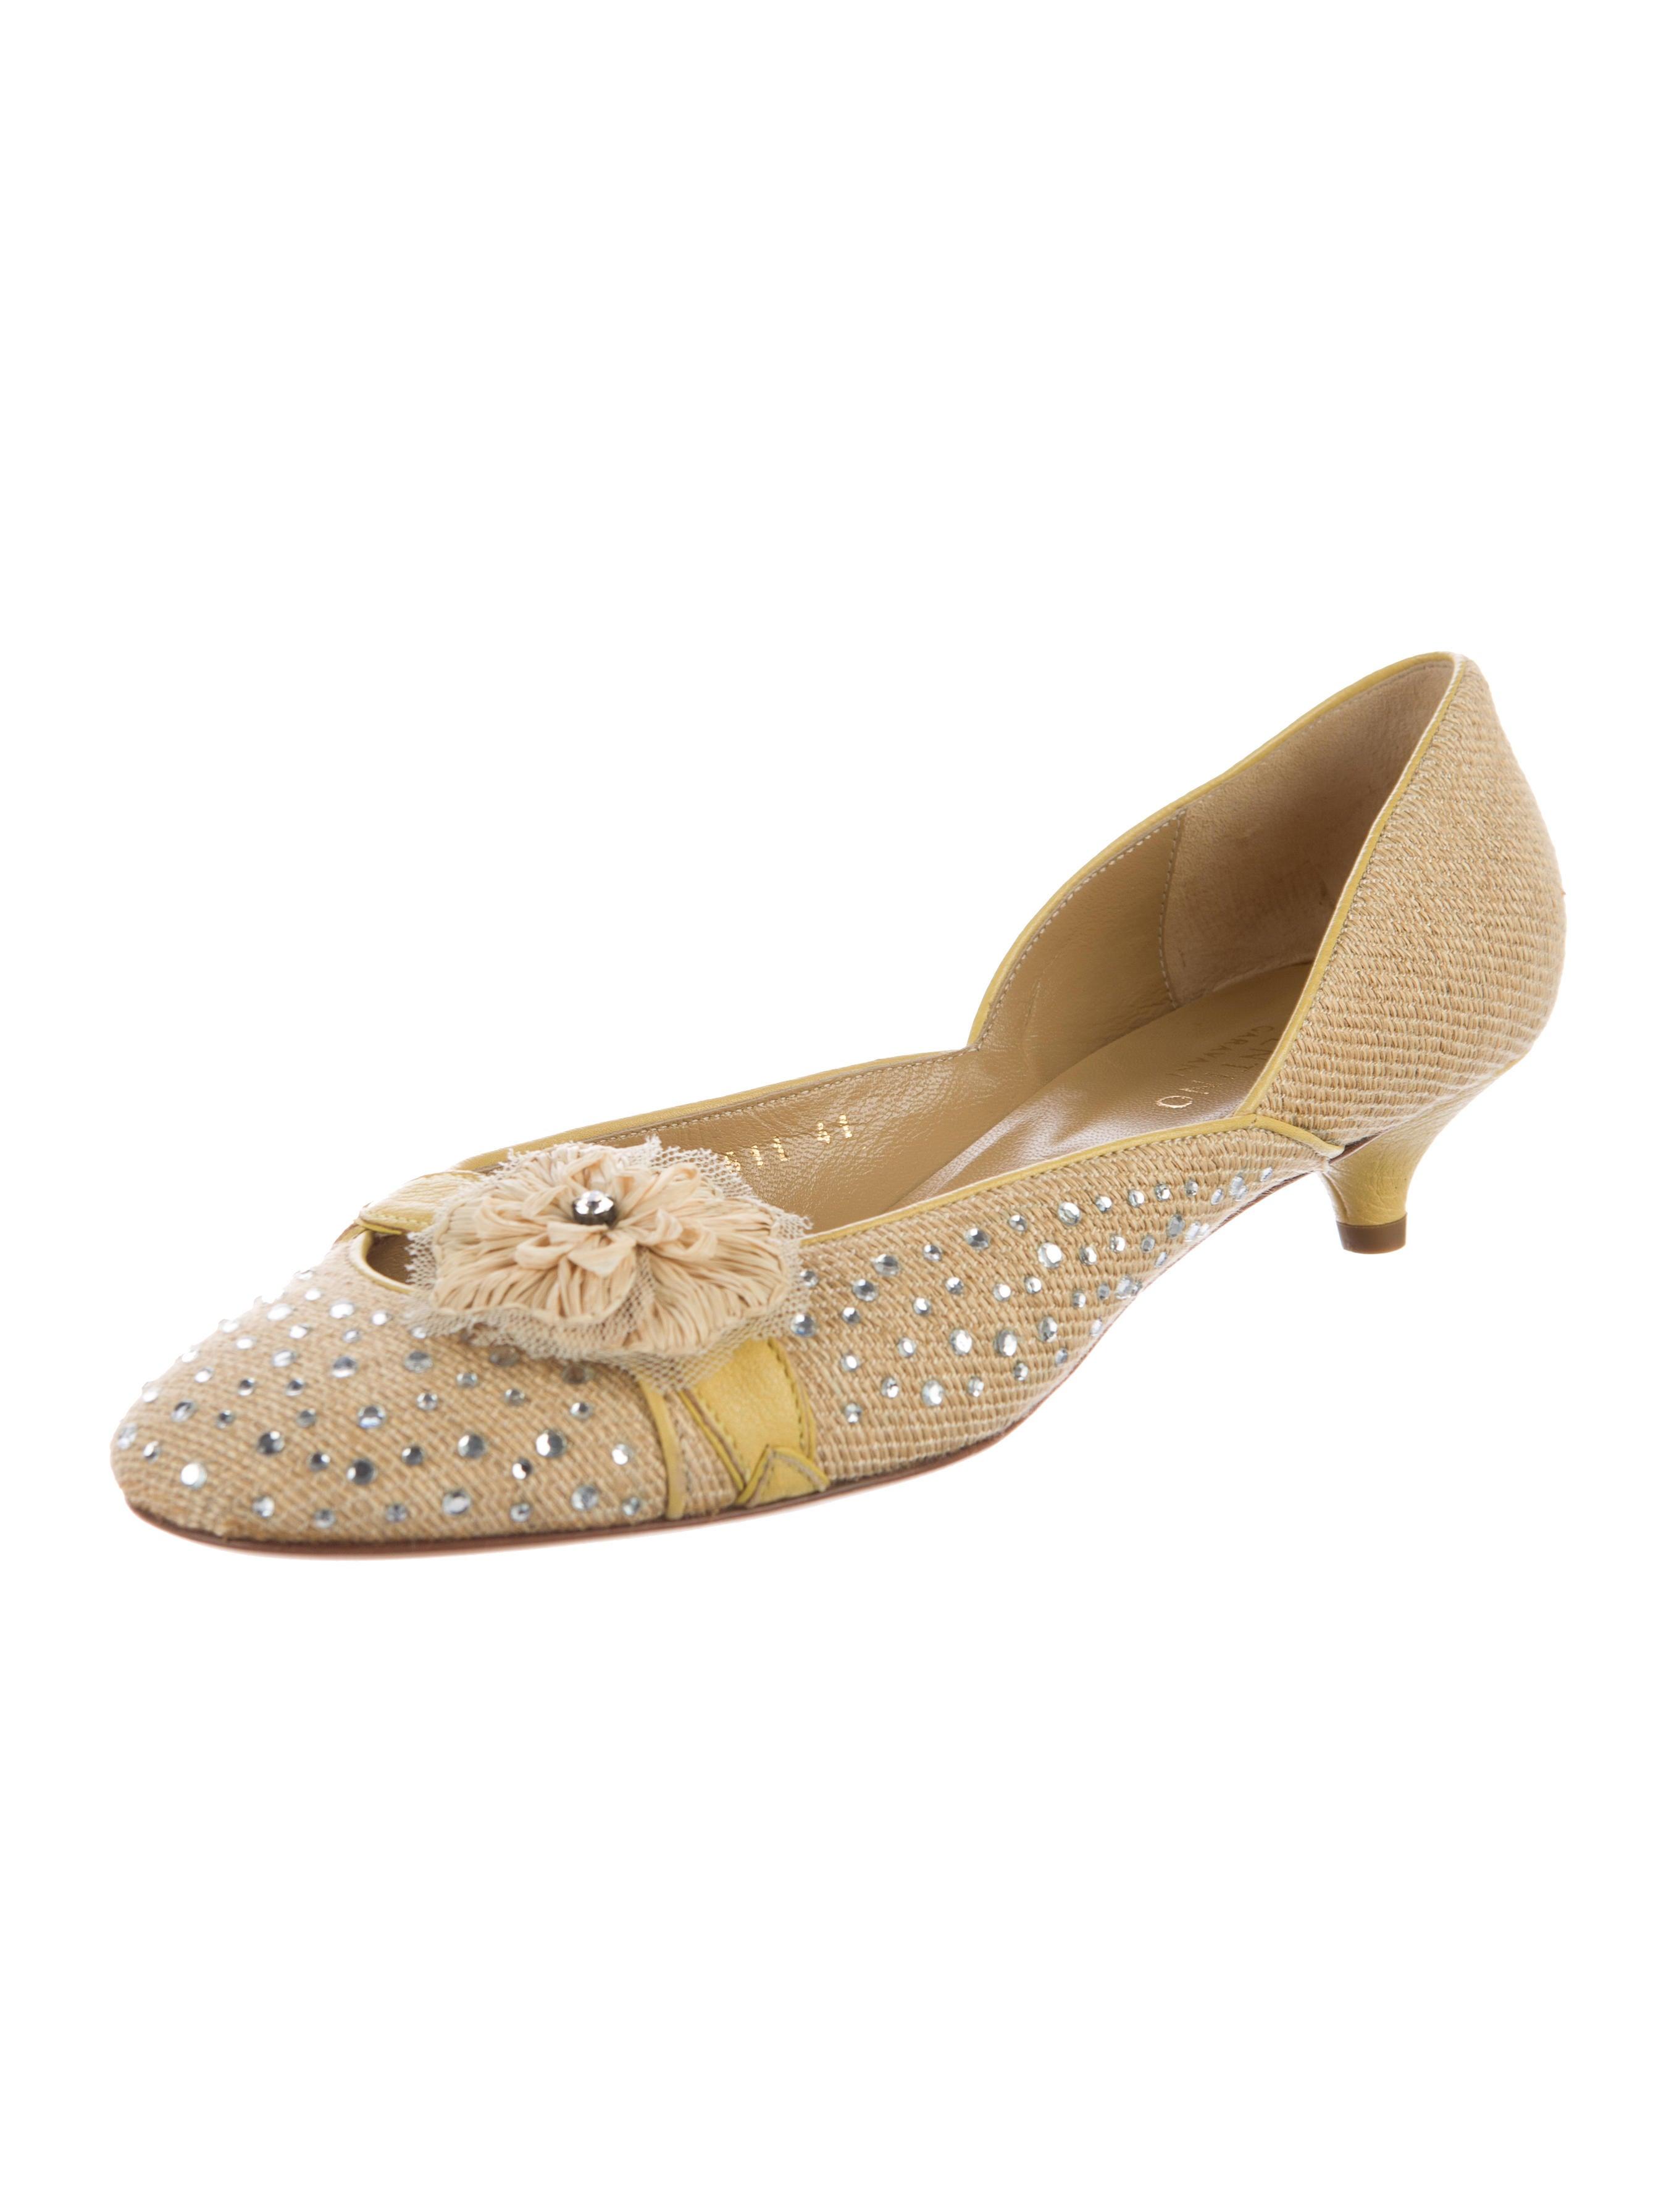 sale best seller sale Inexpensive Valentino Embellished Raffia Pumps free shipping footlocker pictures nabWUU